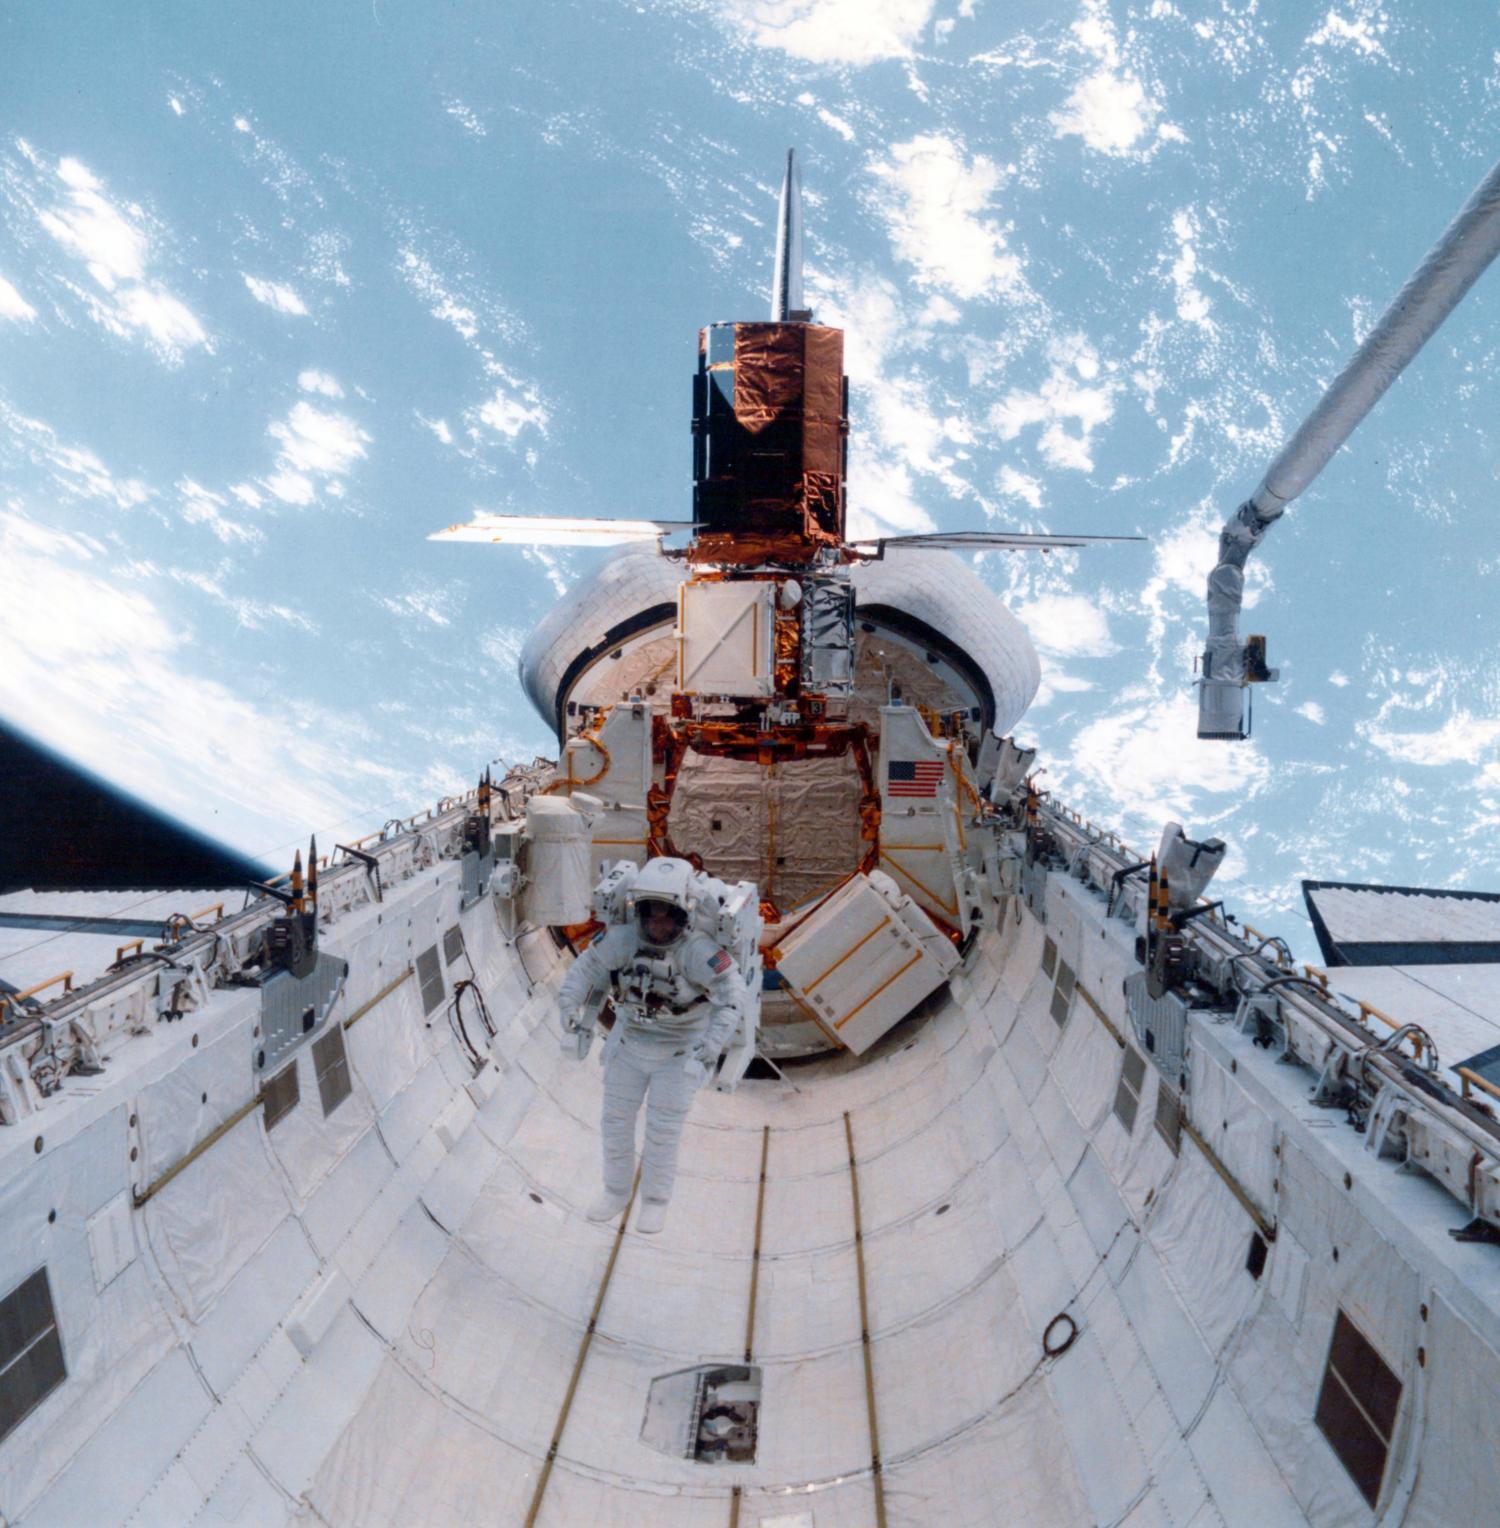 astronaut space shuttle - photo #39